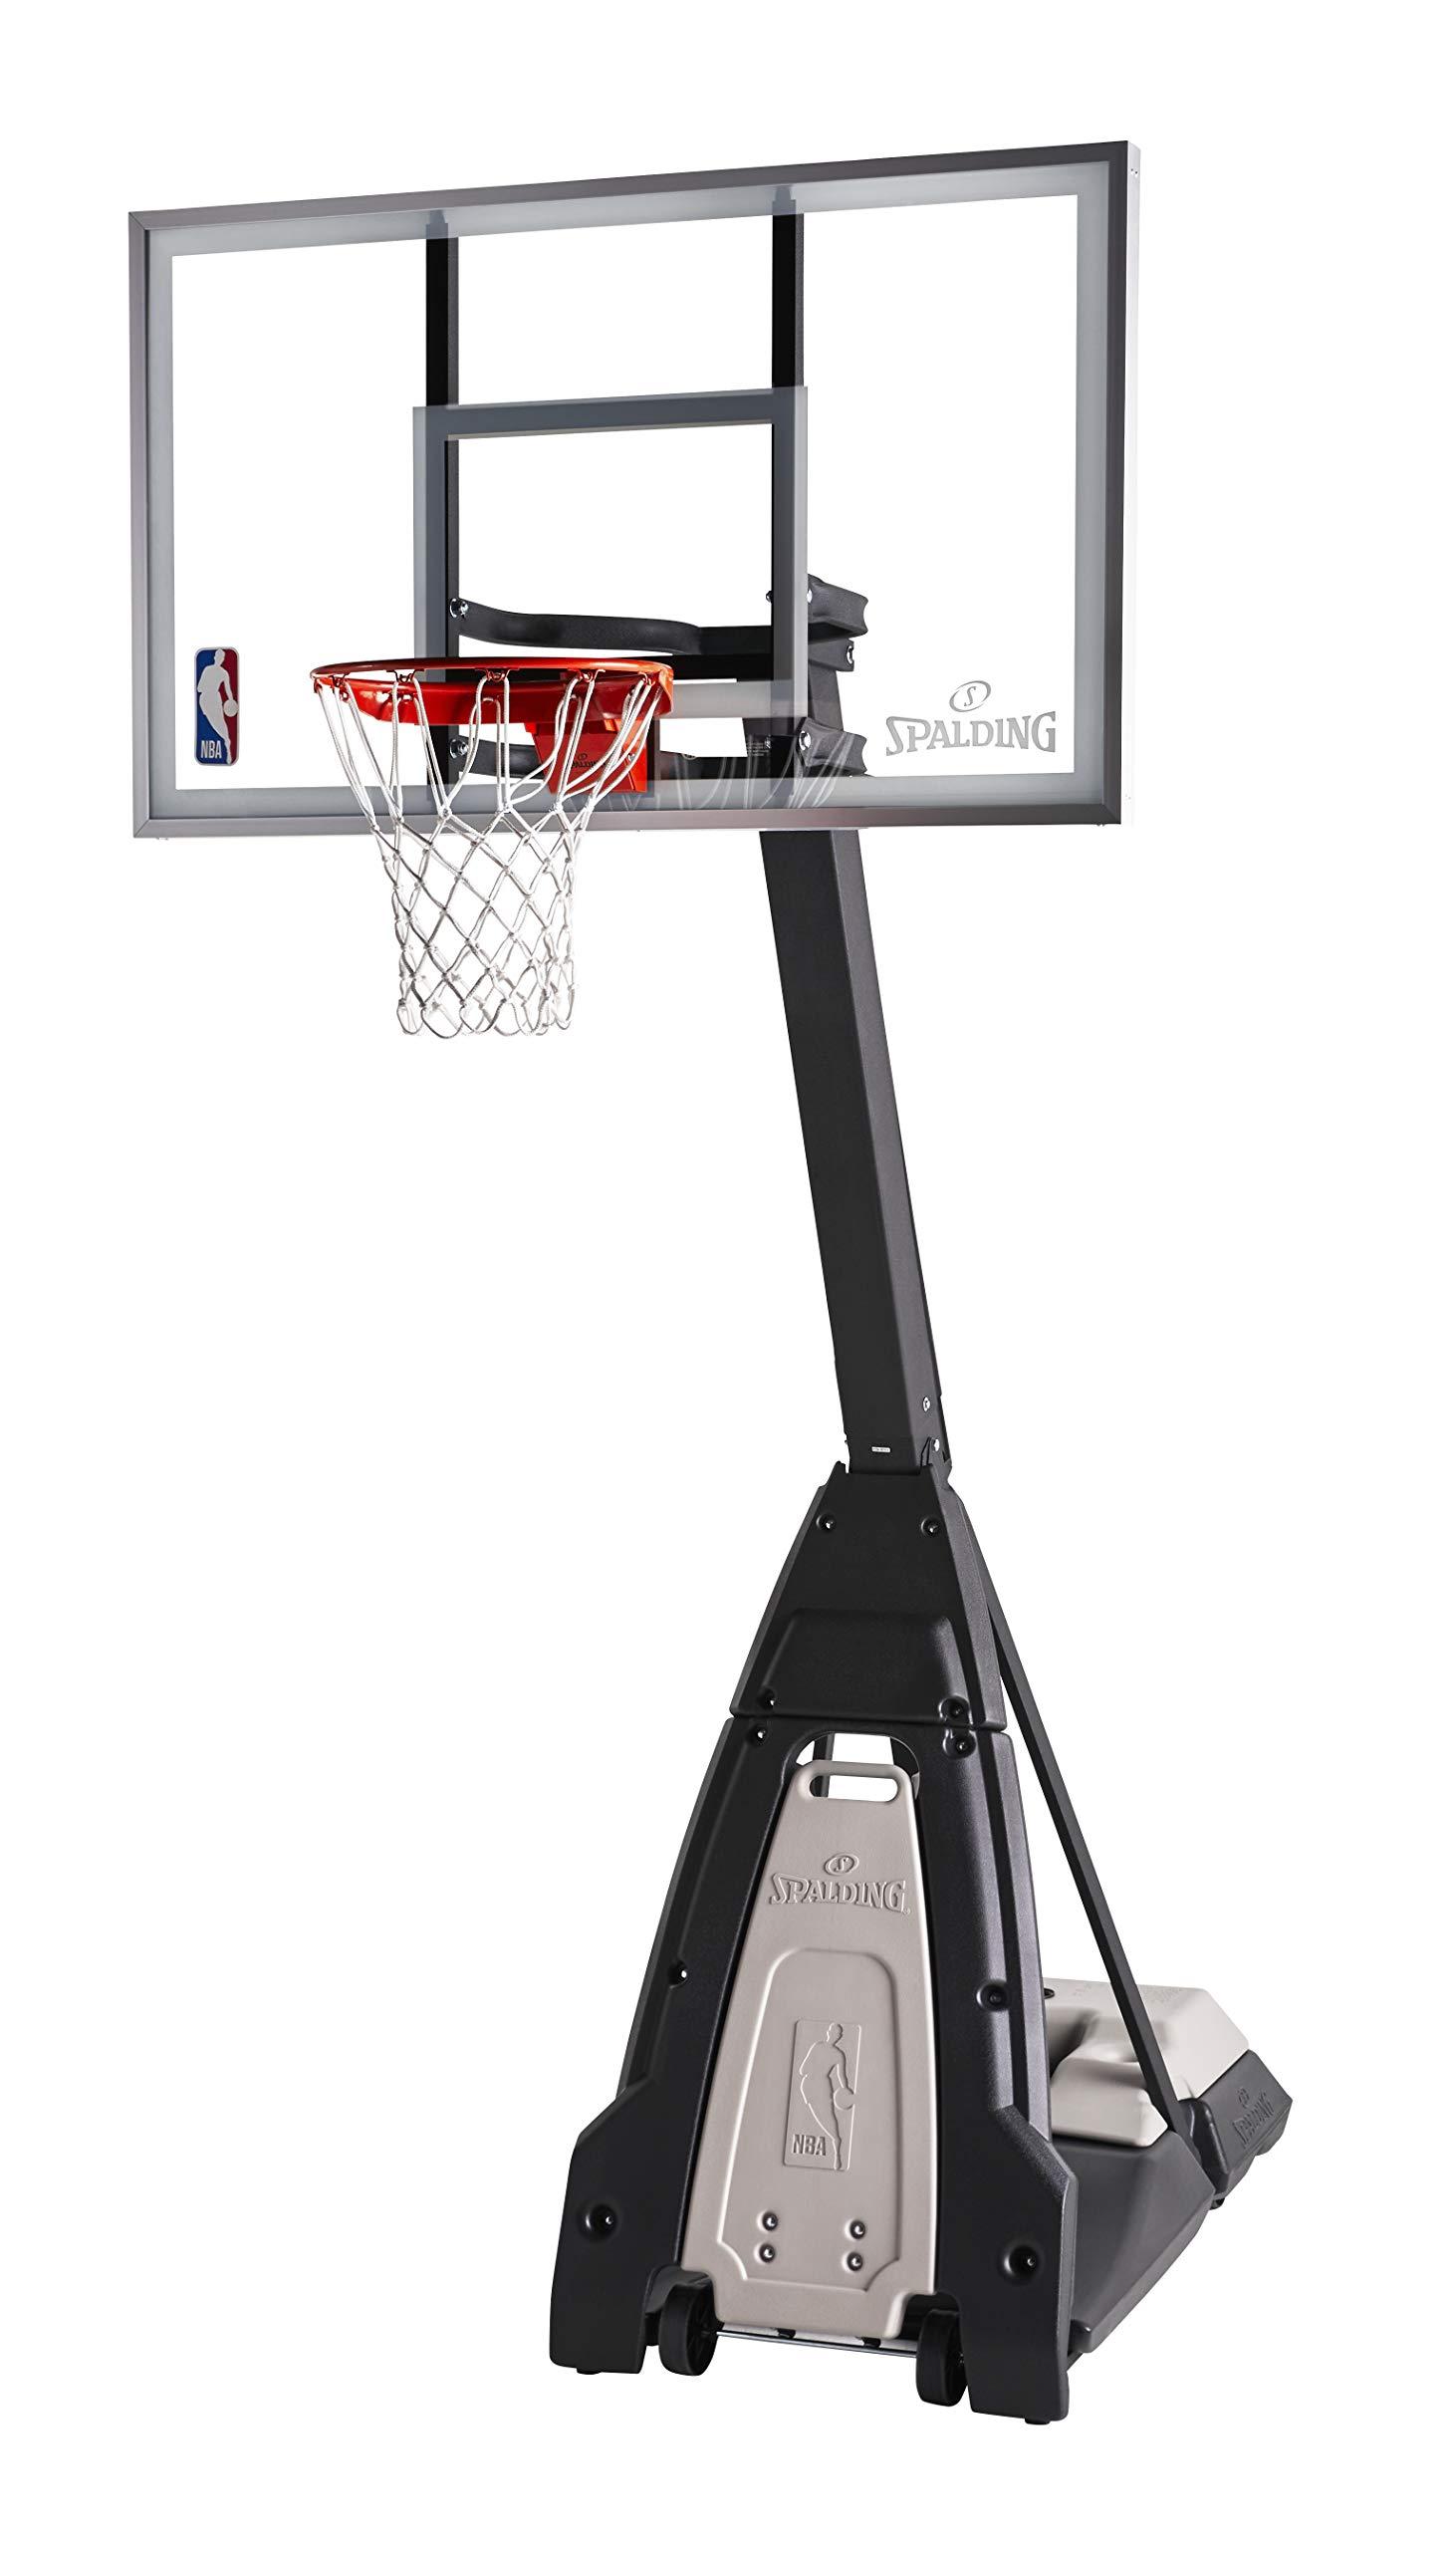 Spalding NBA ''The Beast'' Portable Basketball System - 60'' Glass Backboard